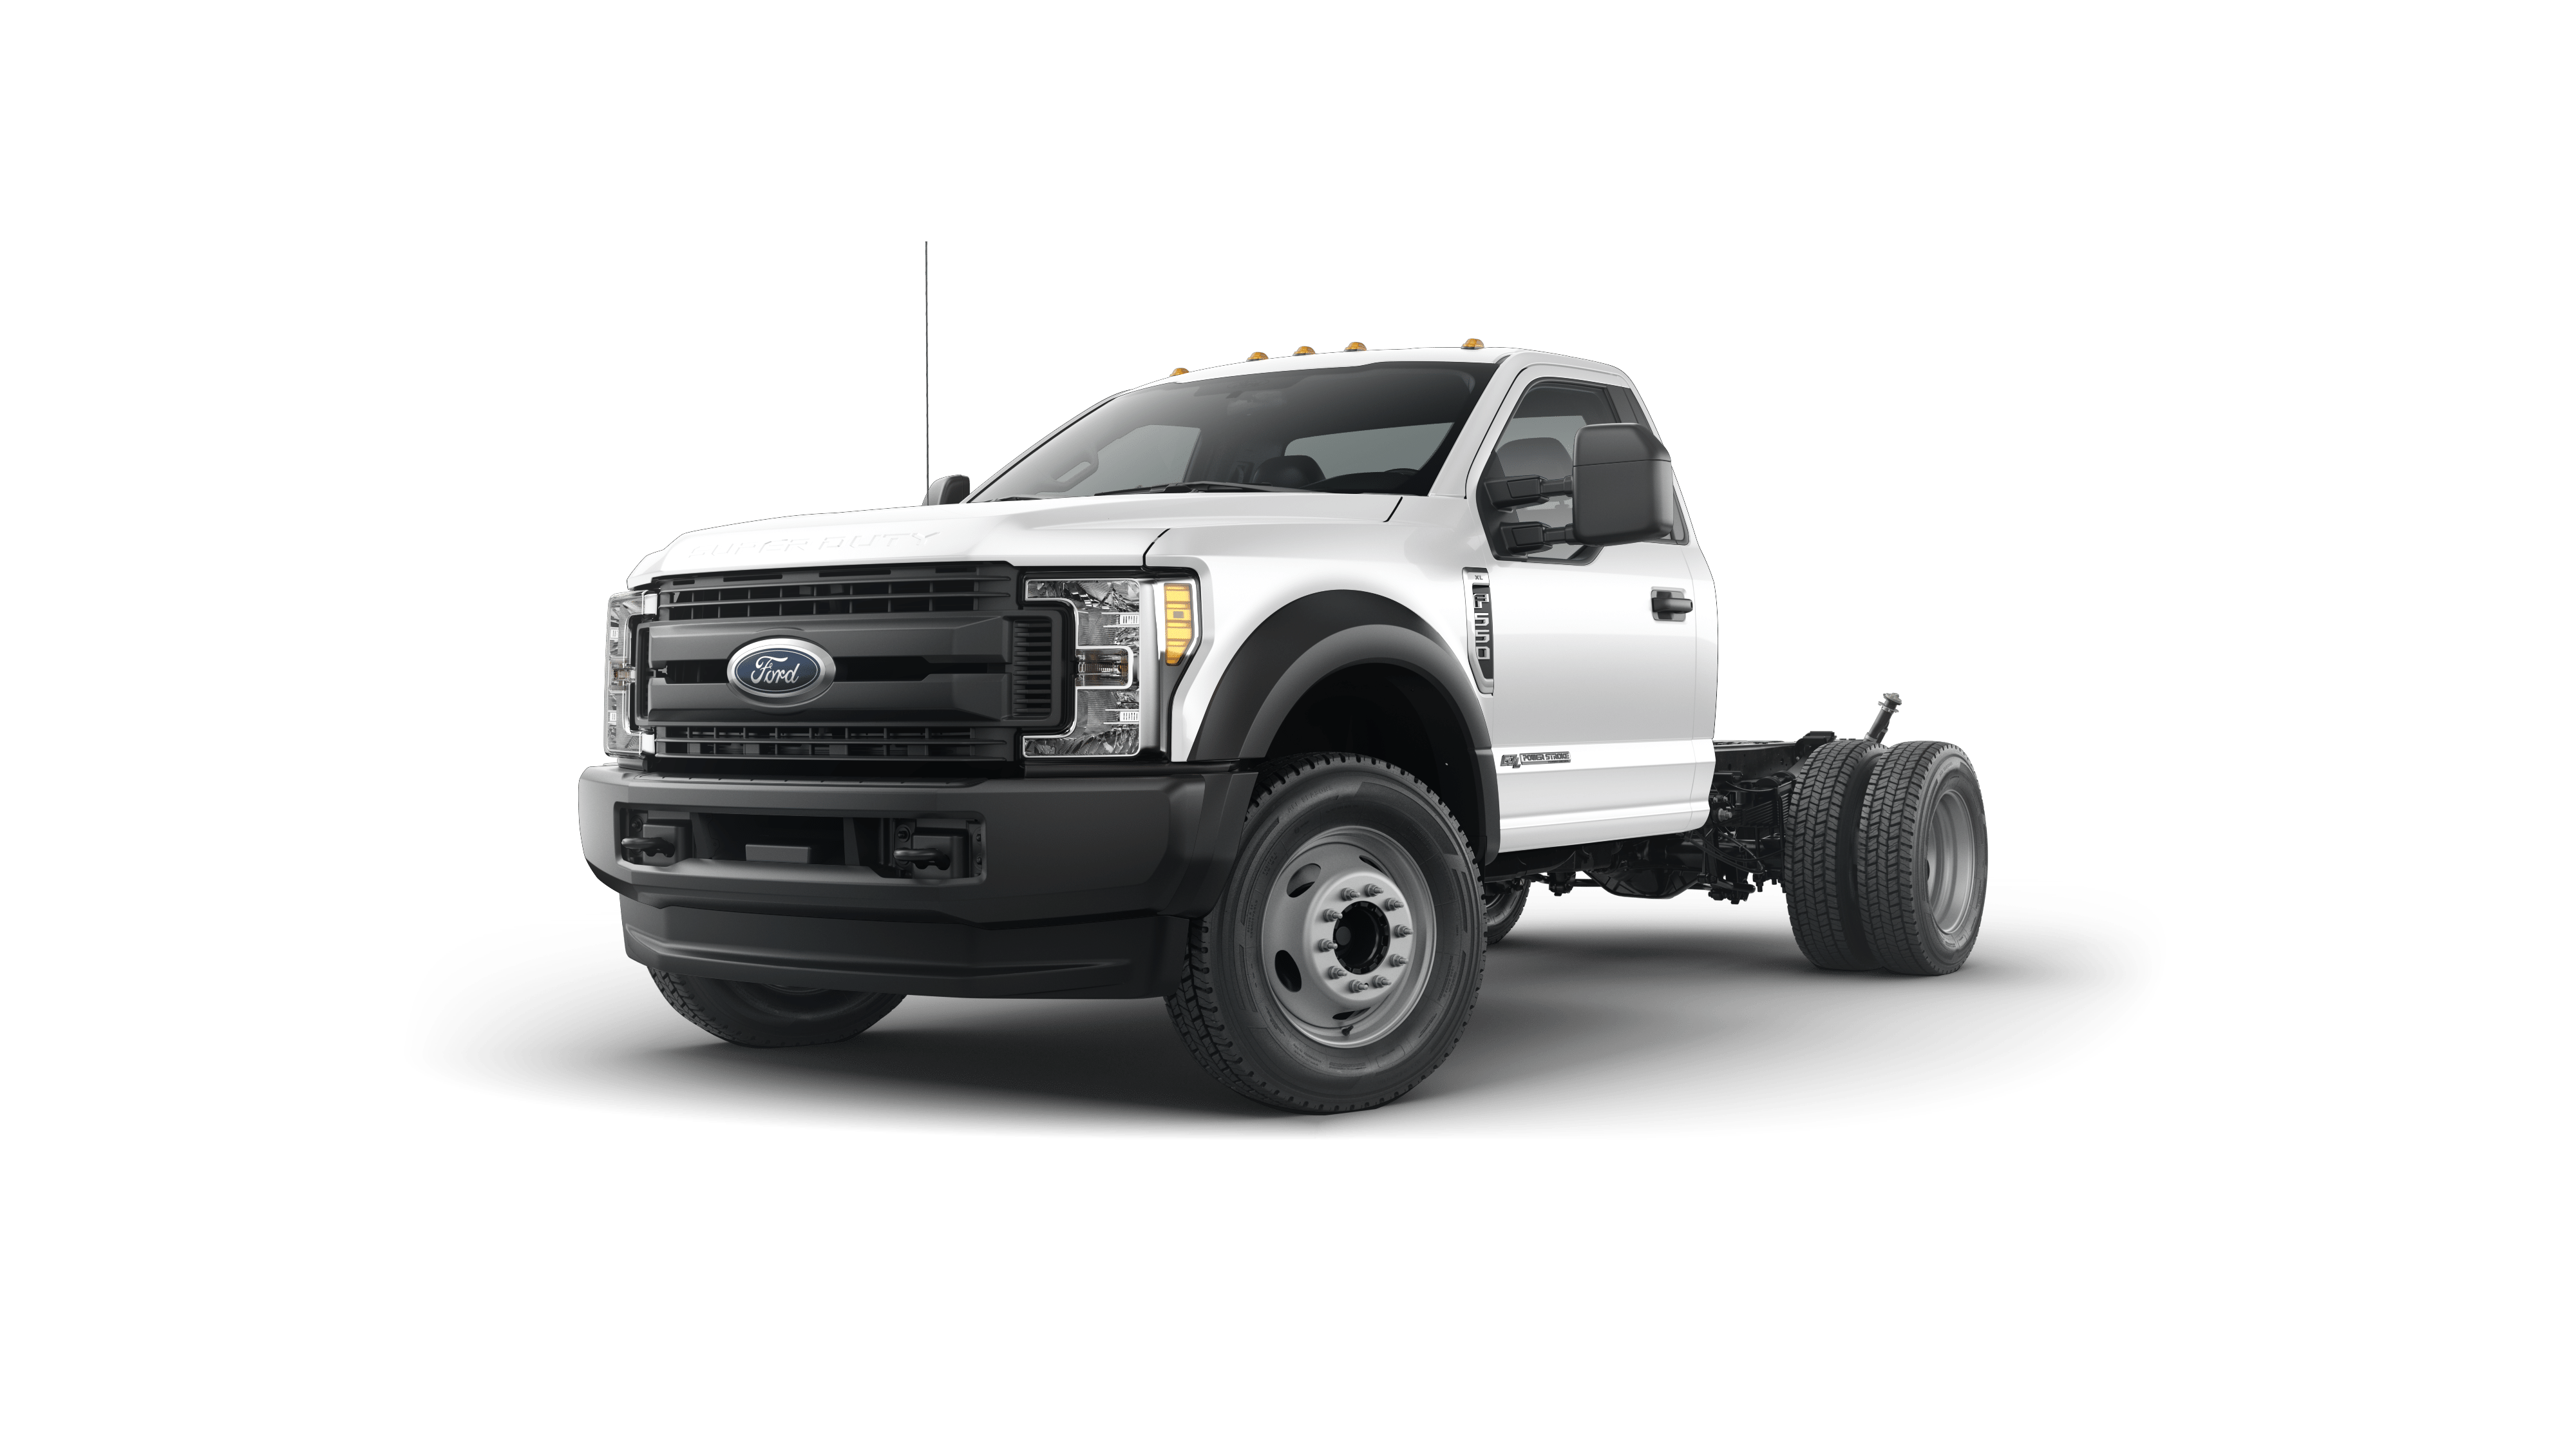 Black License Plate Frame California City State Auto Accessory 1152